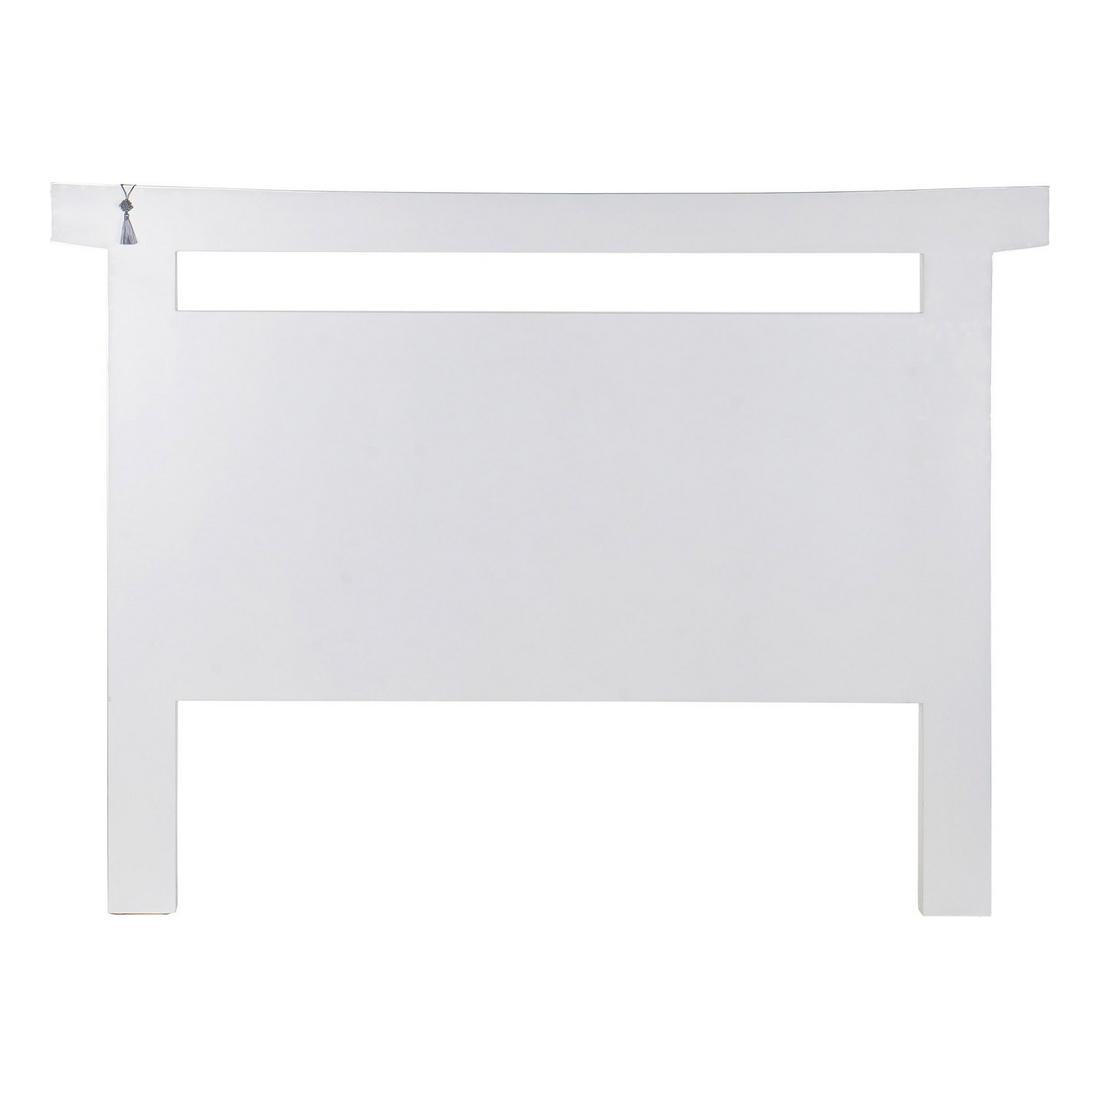 Headboard DKD Home Decor Fir (160 x 4 x 120 cm)